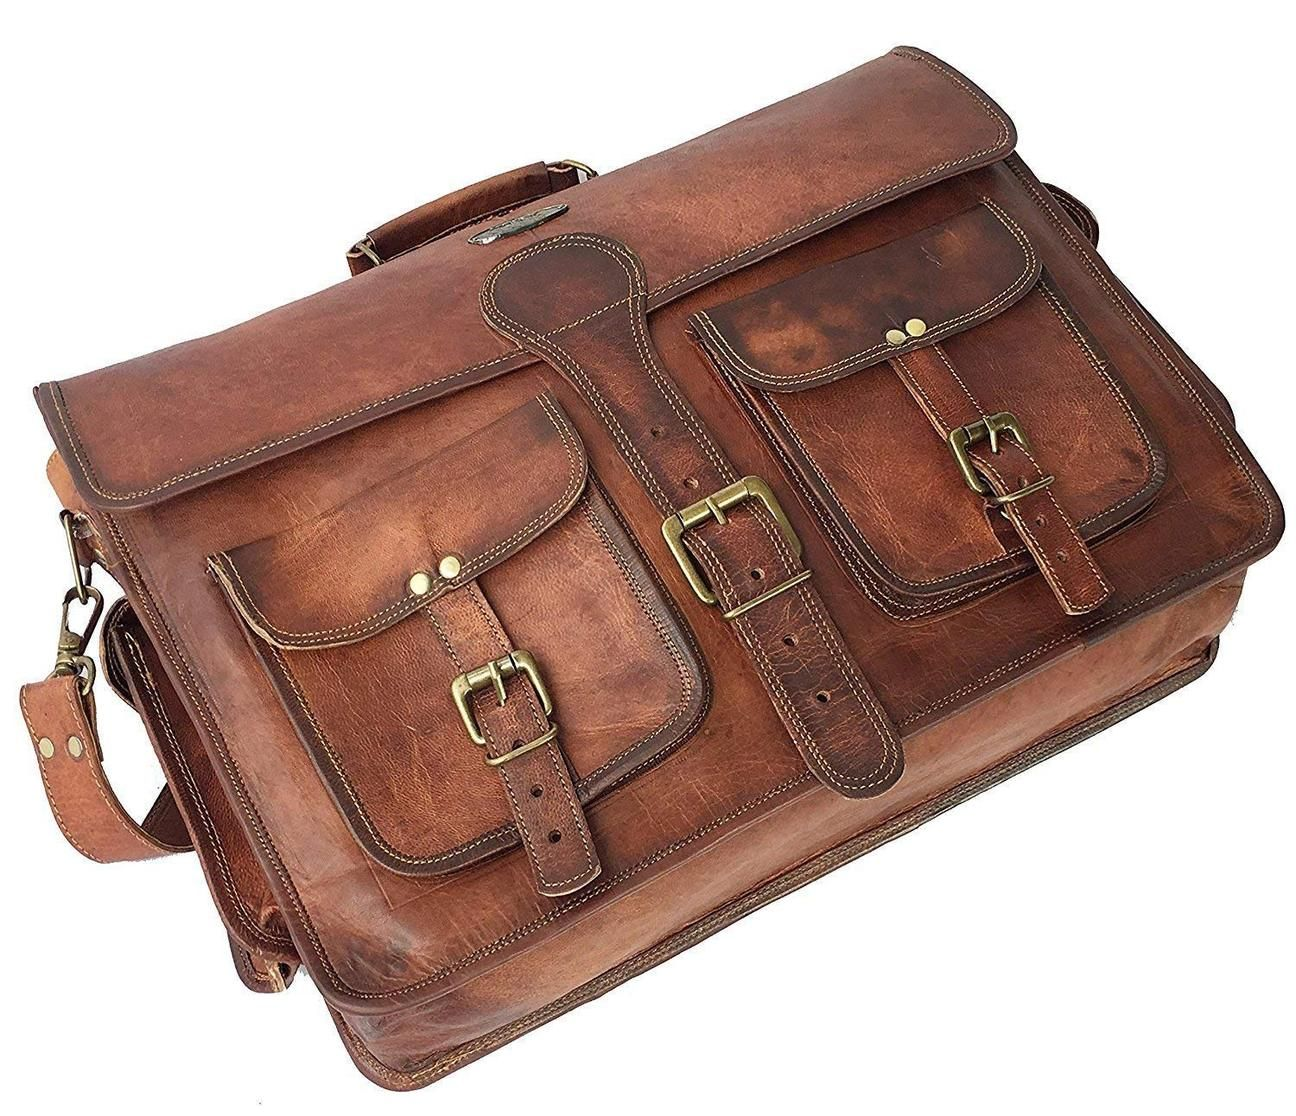 18 Inch Leather Messenger Bag  Vintage Handmade for Briefcase  Laptop  Best Computer Satchel School